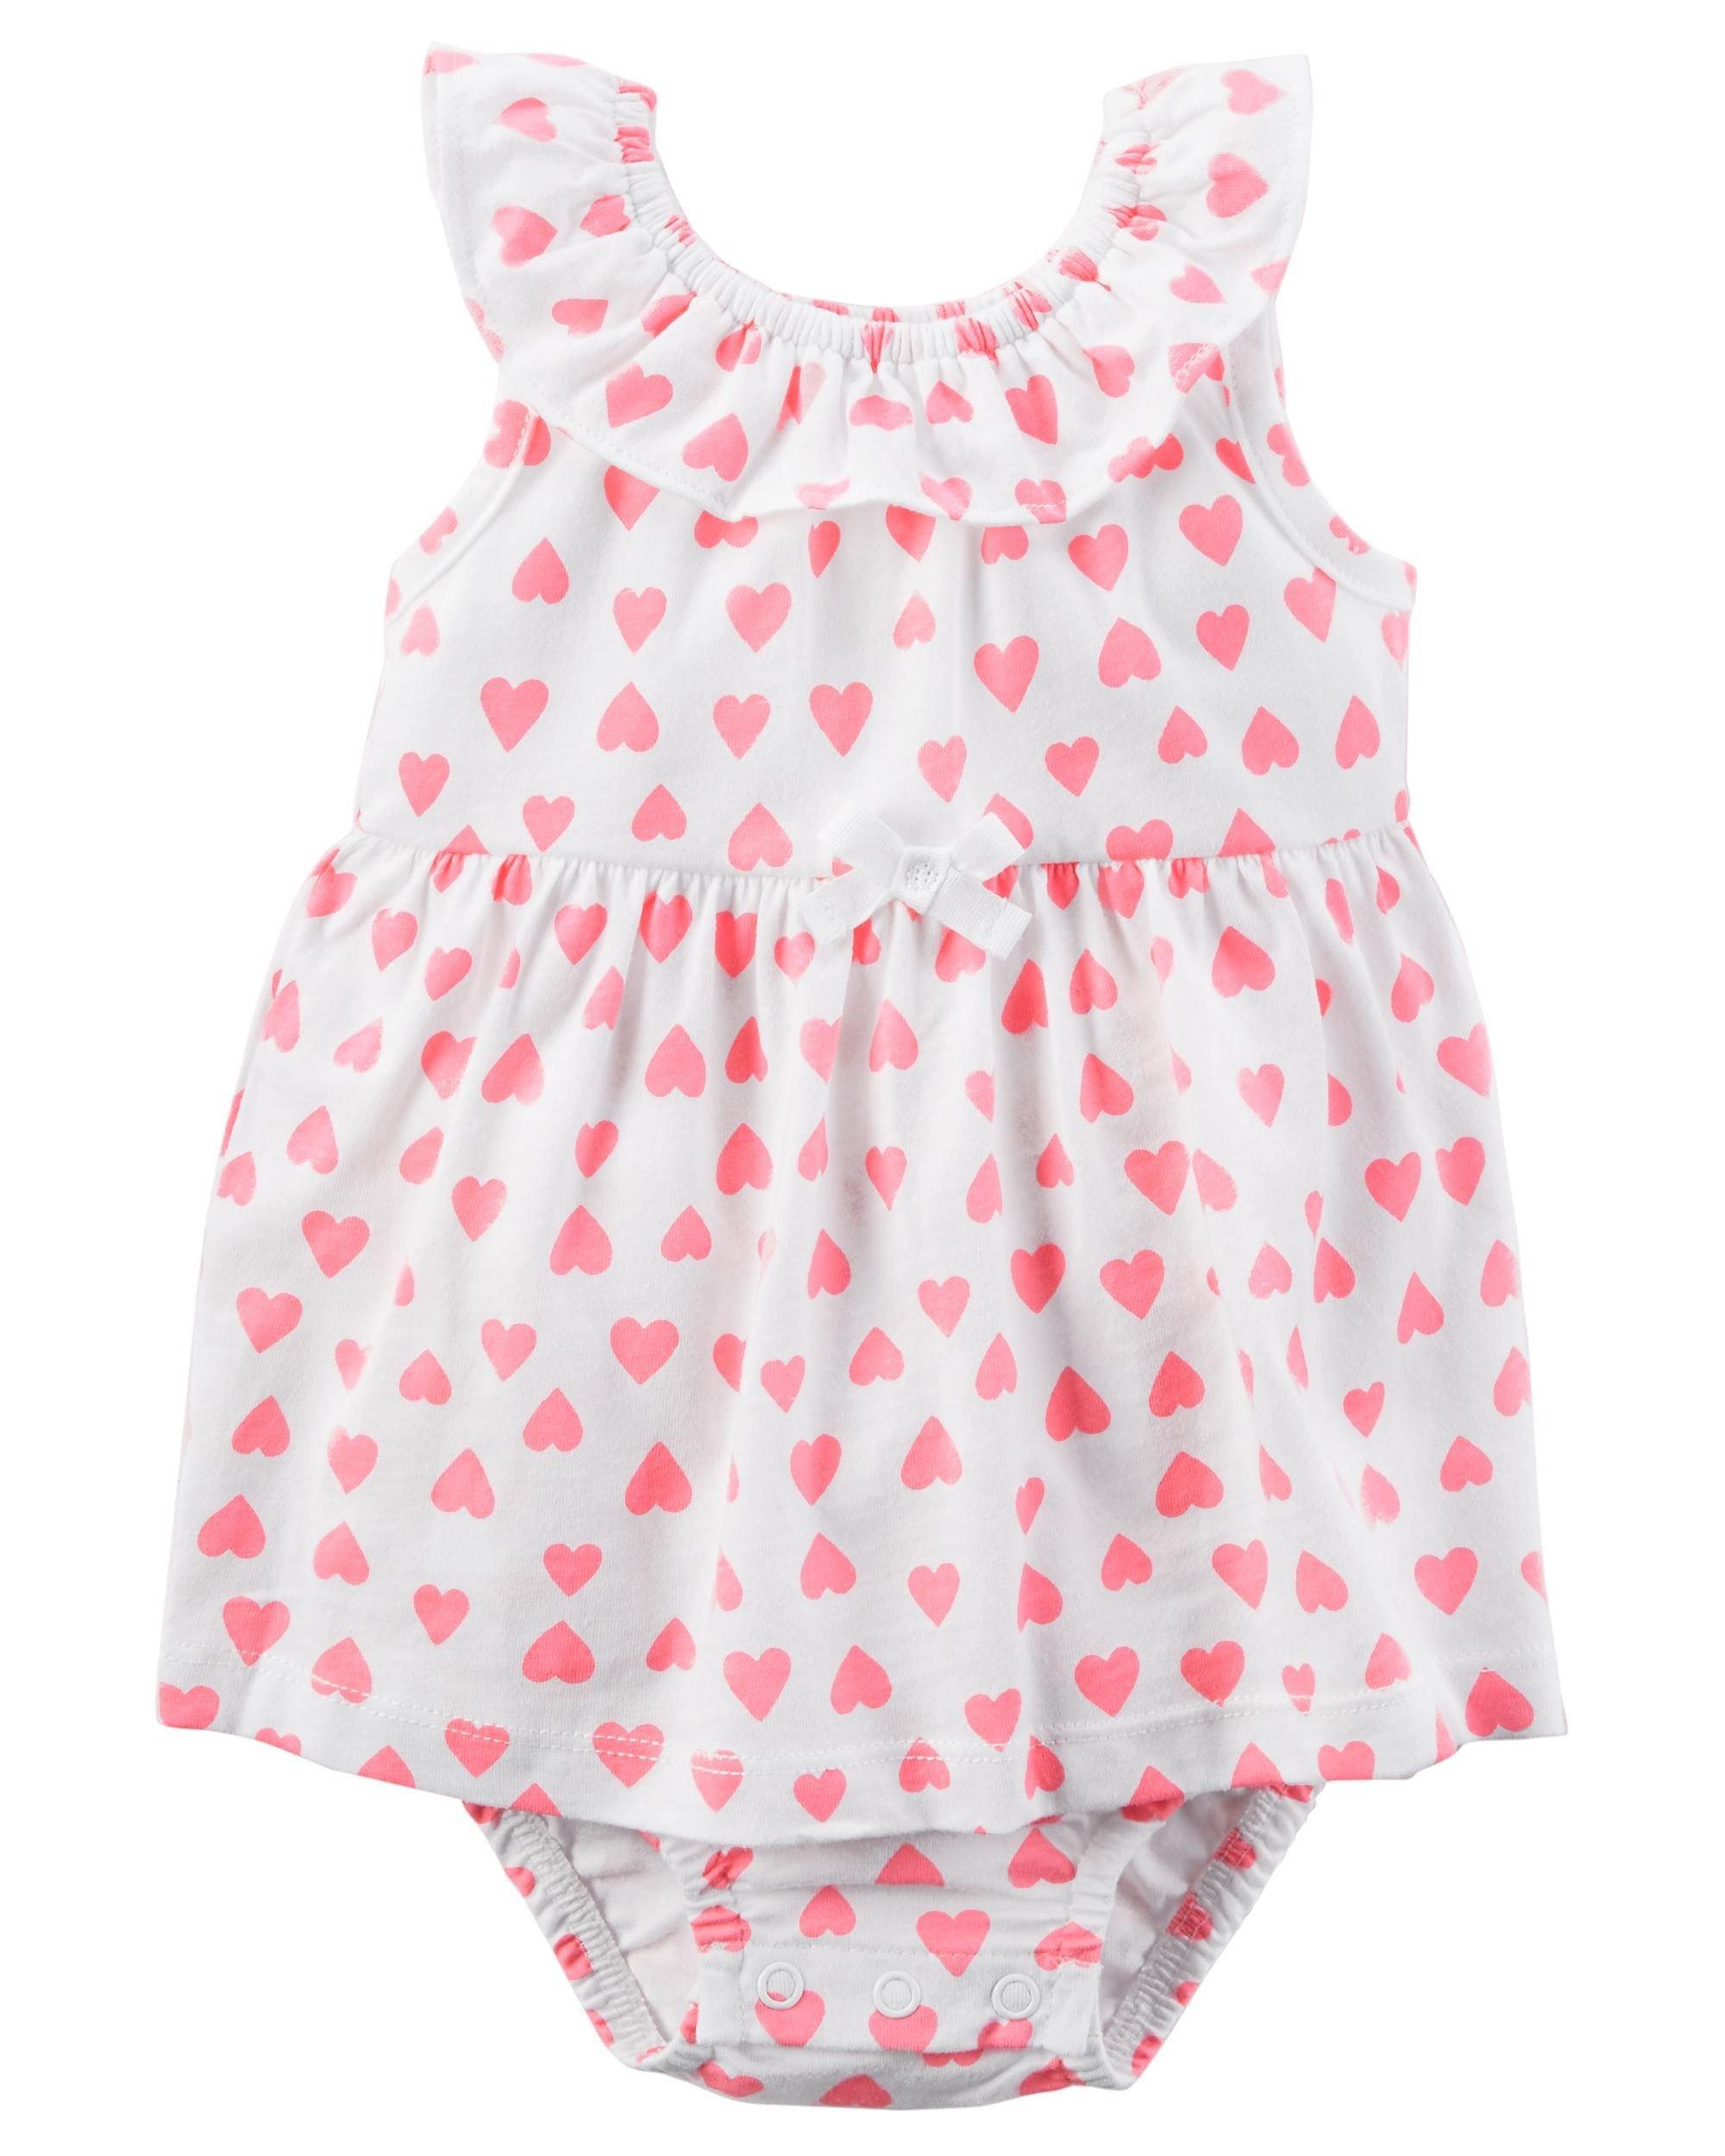 Carter's Baby Girls' Heart Sunsuit- Newborn